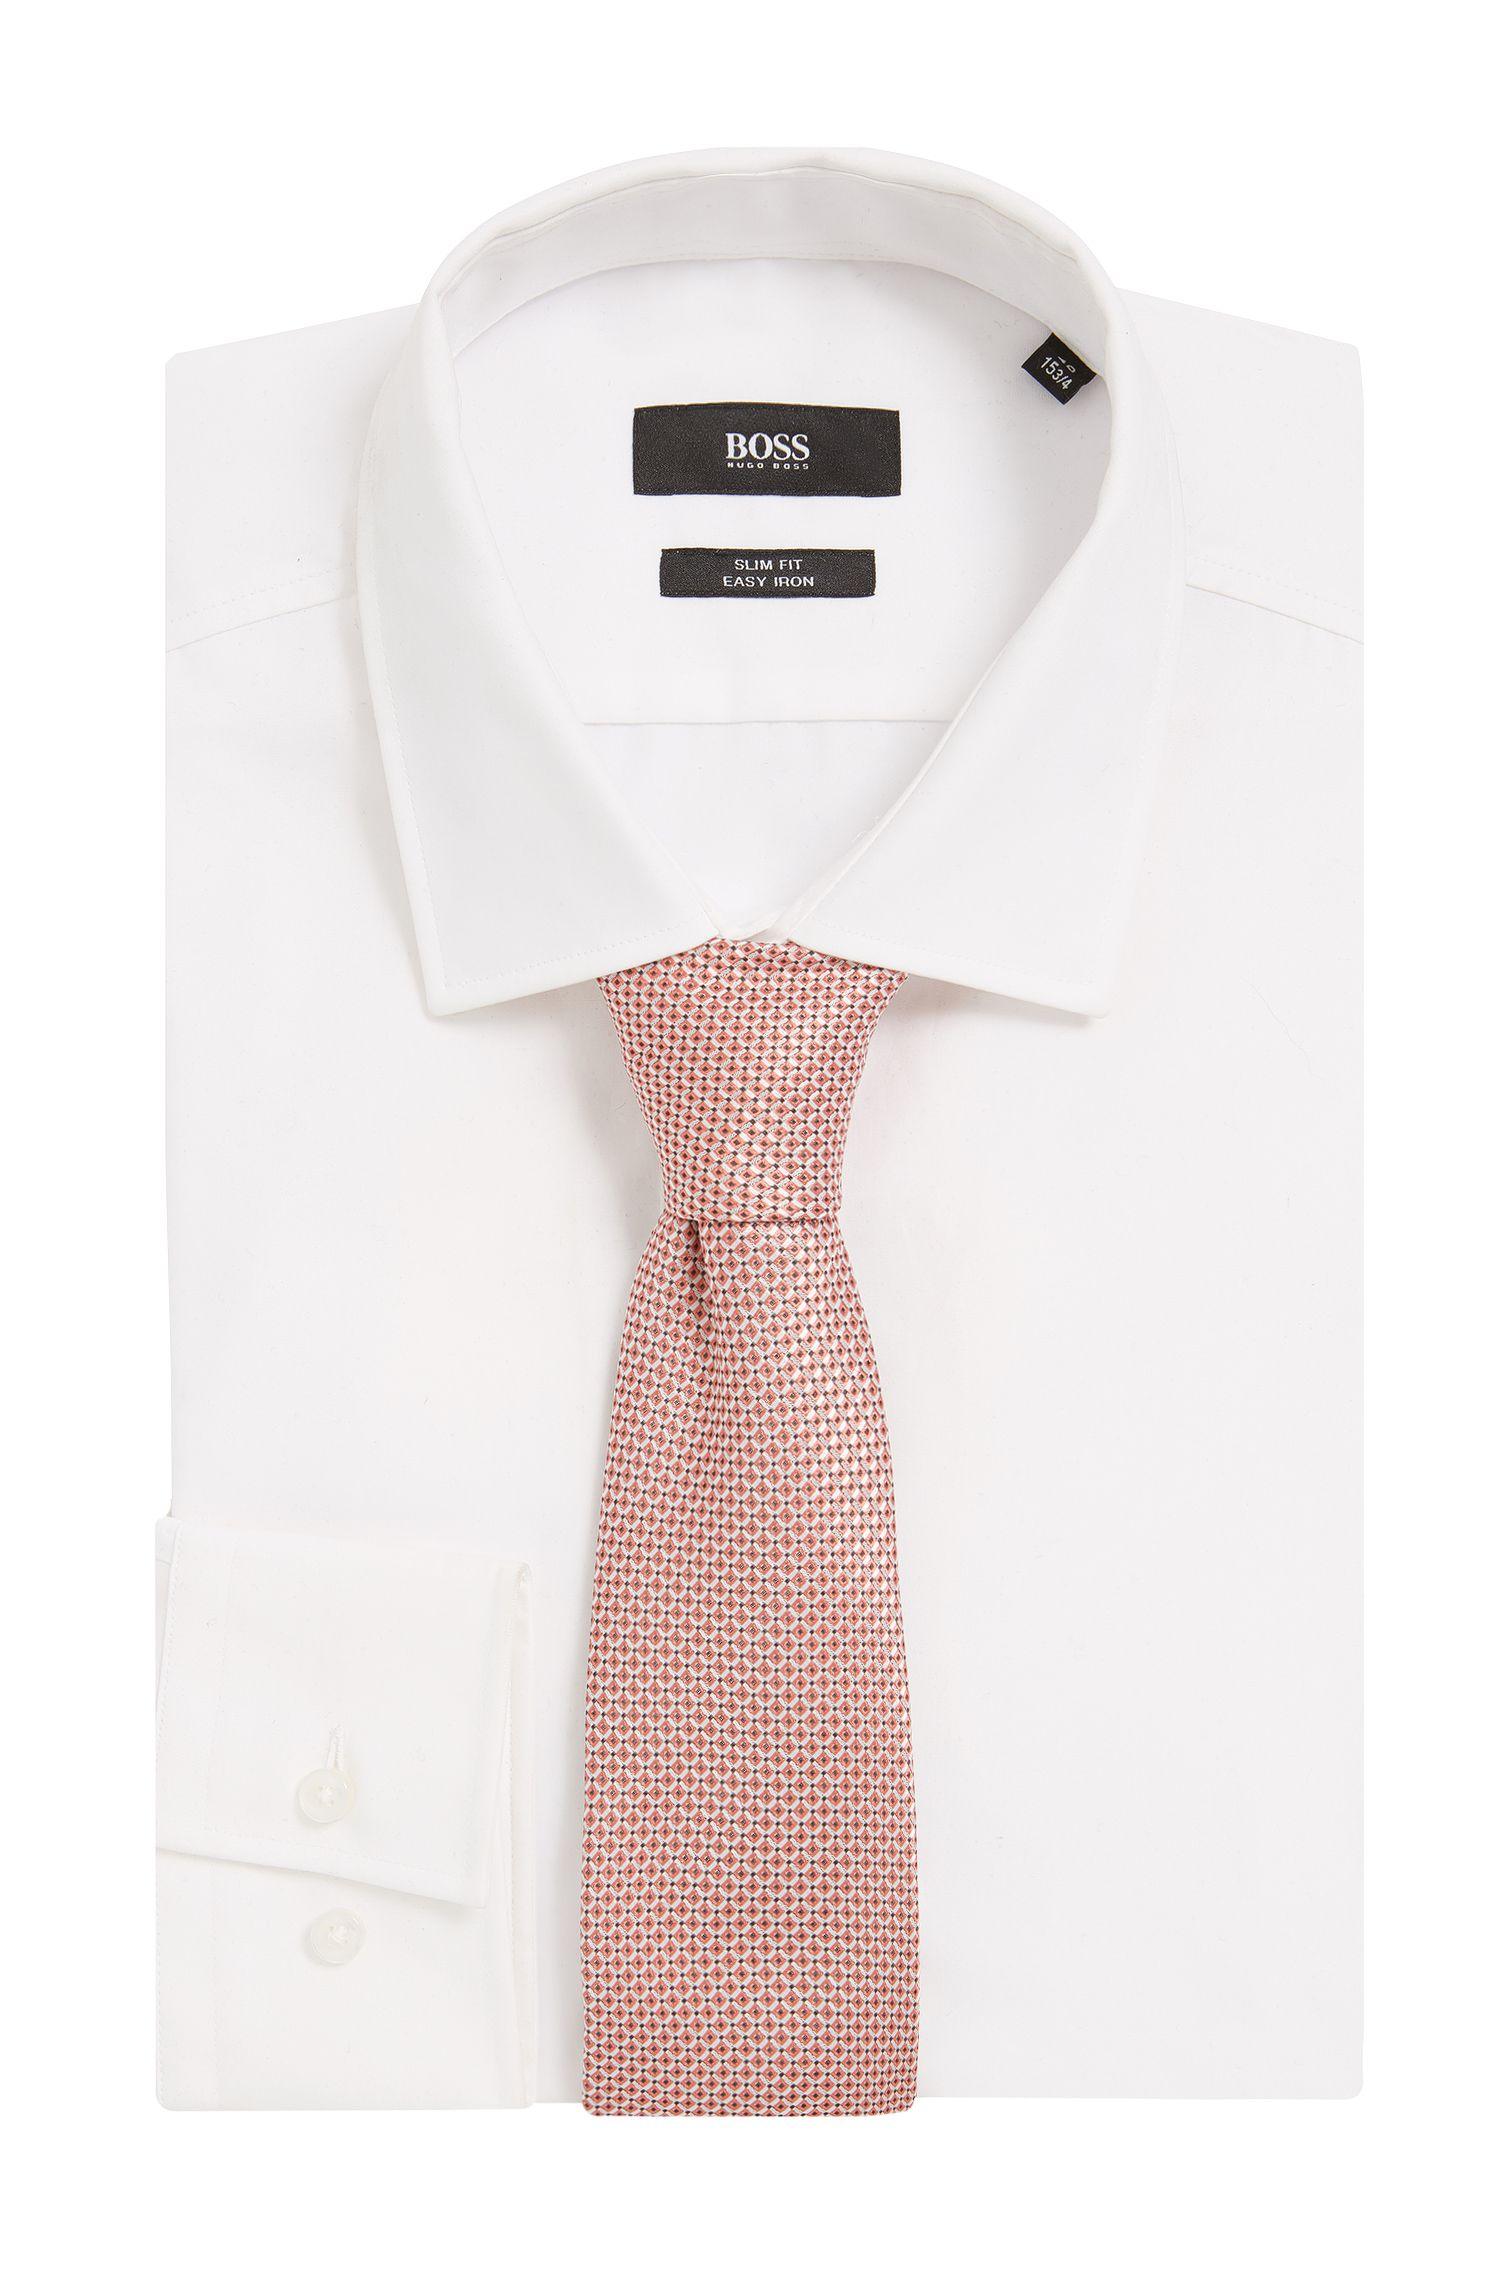 BOSS Tailored Italian Silk Jacquard Tie, Open Red